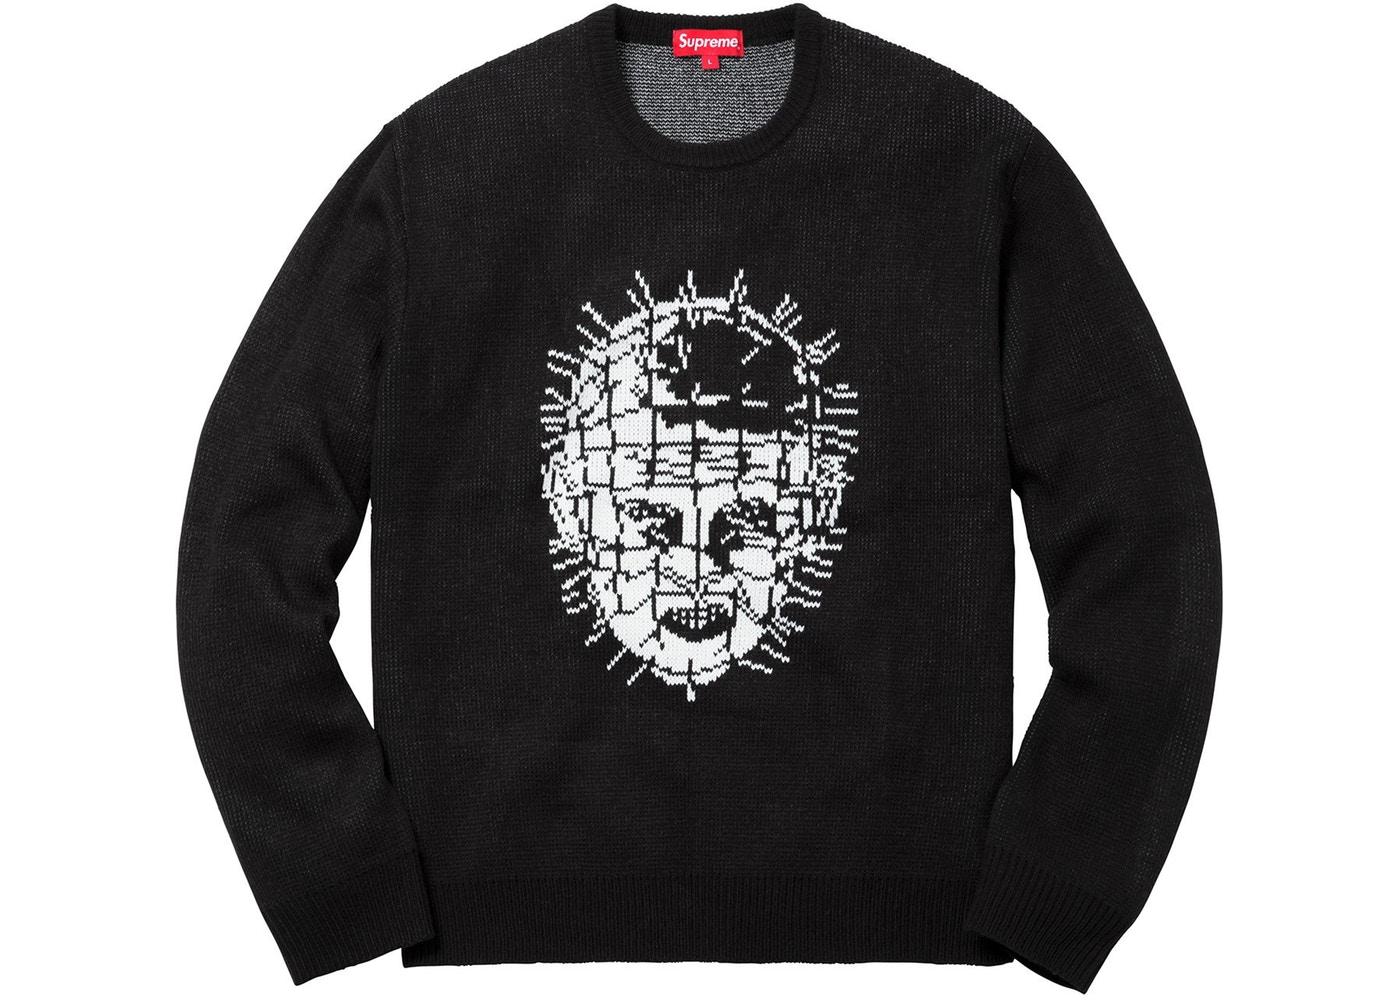 c2e98853411f Supreme Hellraiser Sweater Black Spring/Summer 2018